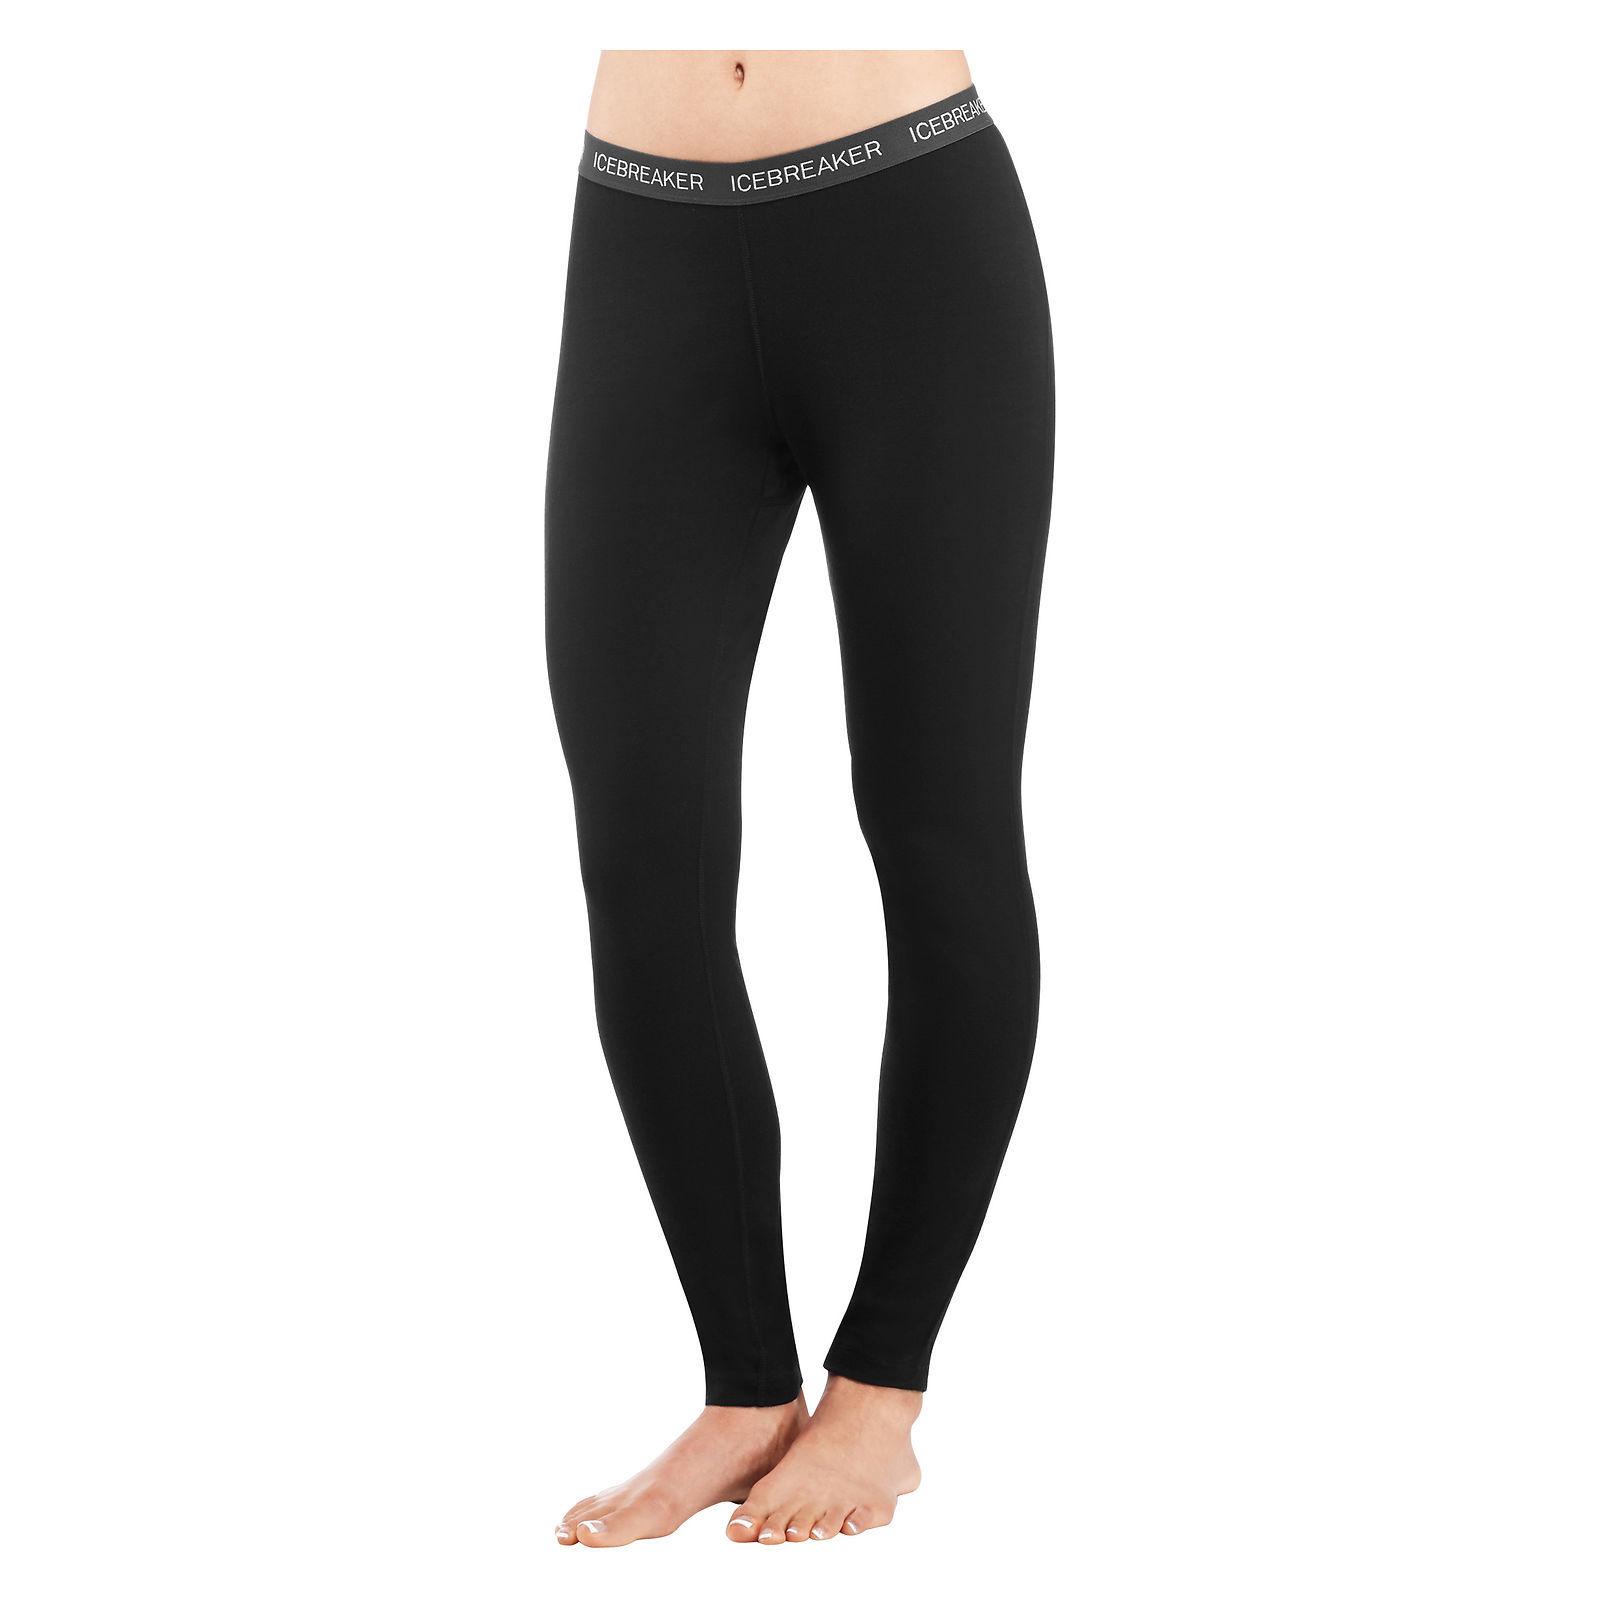 Spodnie IceBreaker Oasis Leggings W 100521